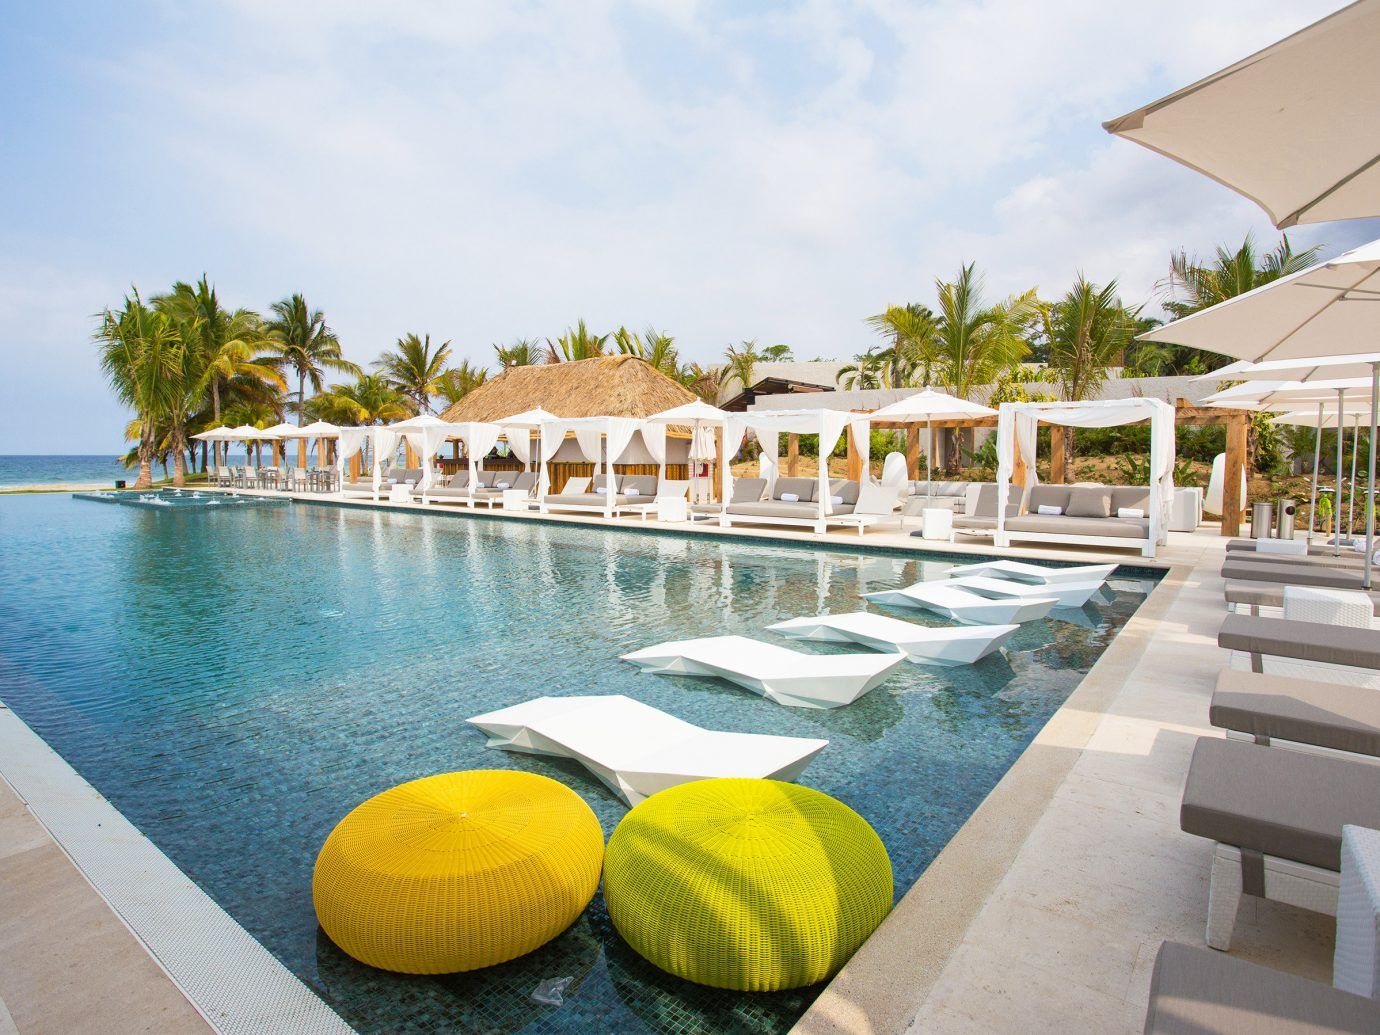 Influencers + Tastemakers Travel Shop Trip Ideas sky outdoor water leisure swimming pool property Pool Resort vacation estate Villa caribbean condominium swimming